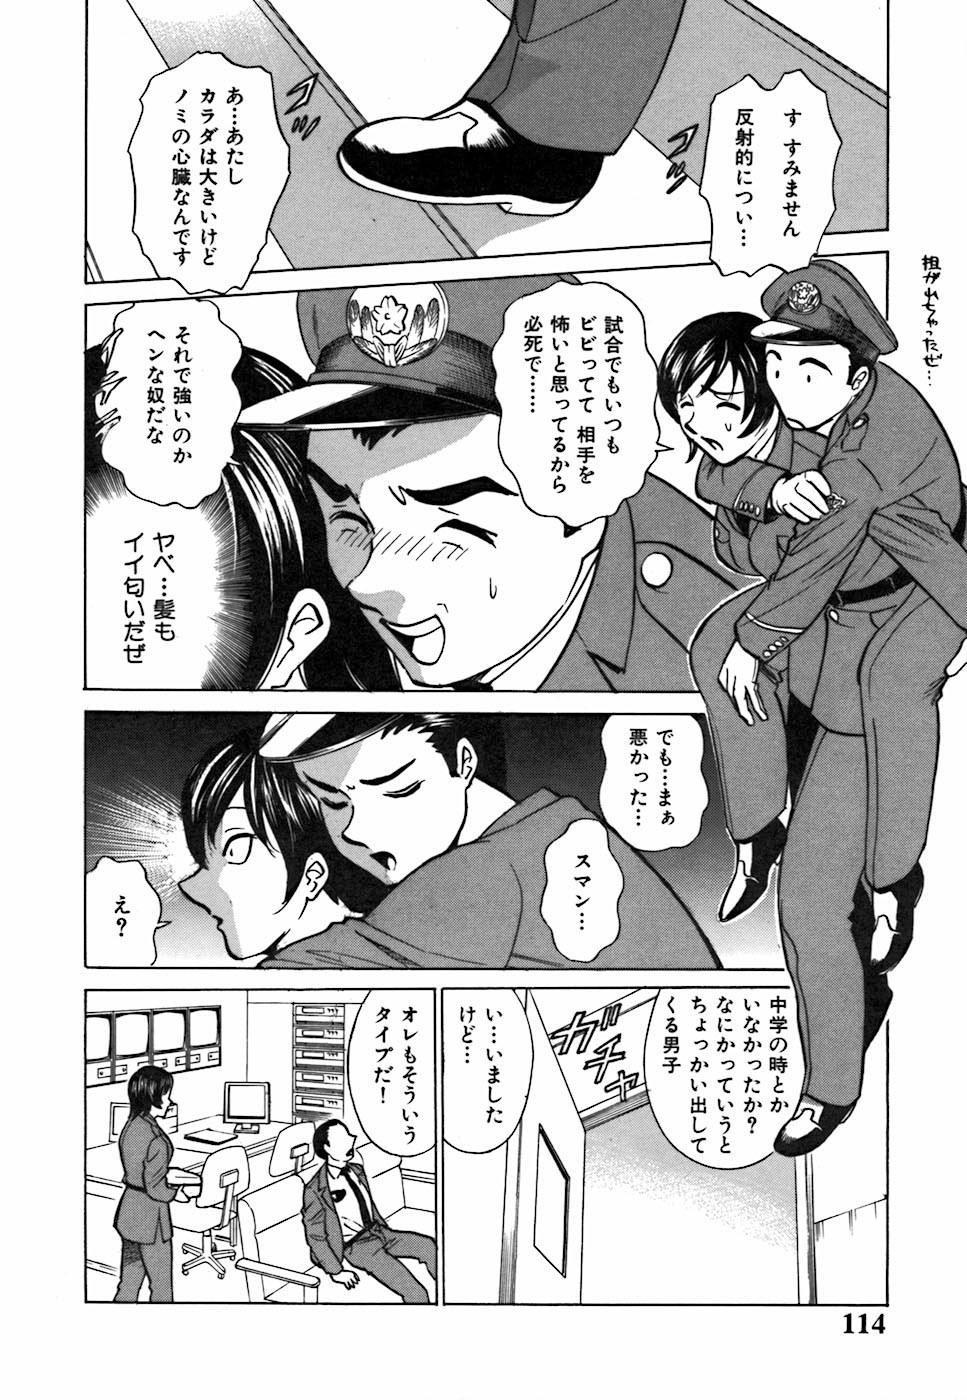 Kimi ga Nozomu Katachi | Appearance for which you hope 113